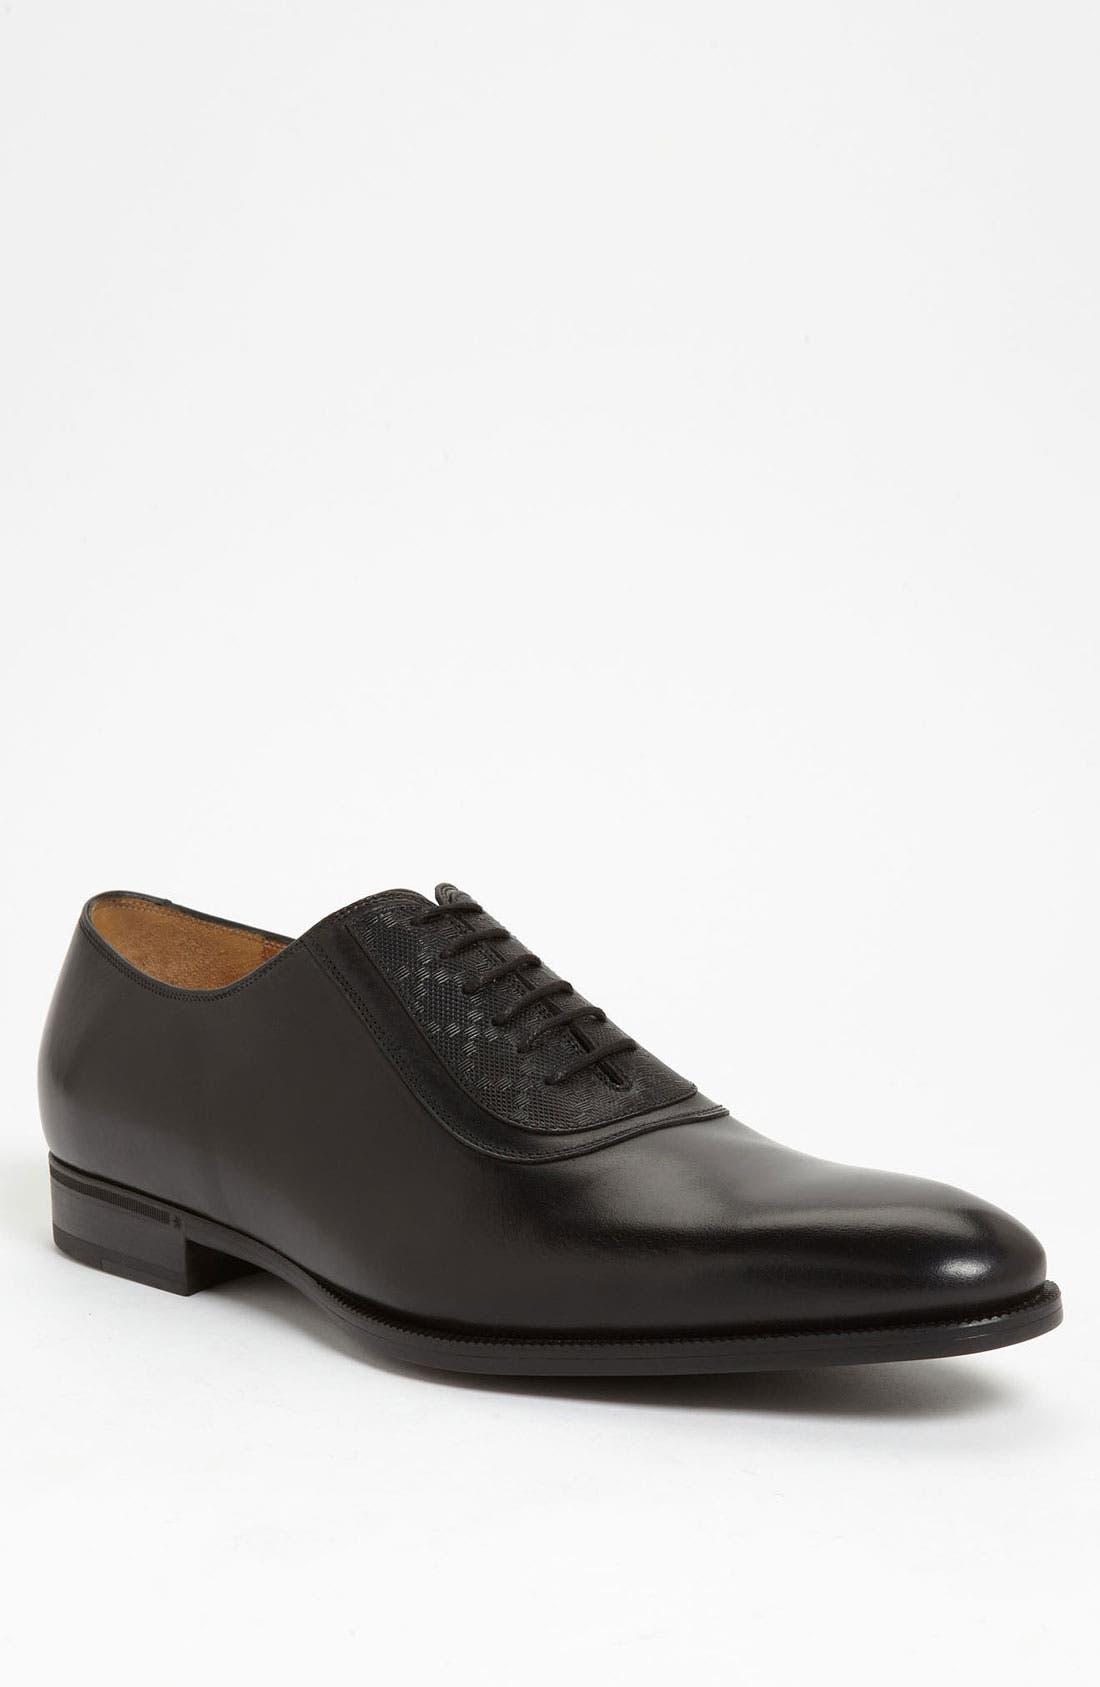 Main Image - Gucci 'Noort' Plain Toe Oxford